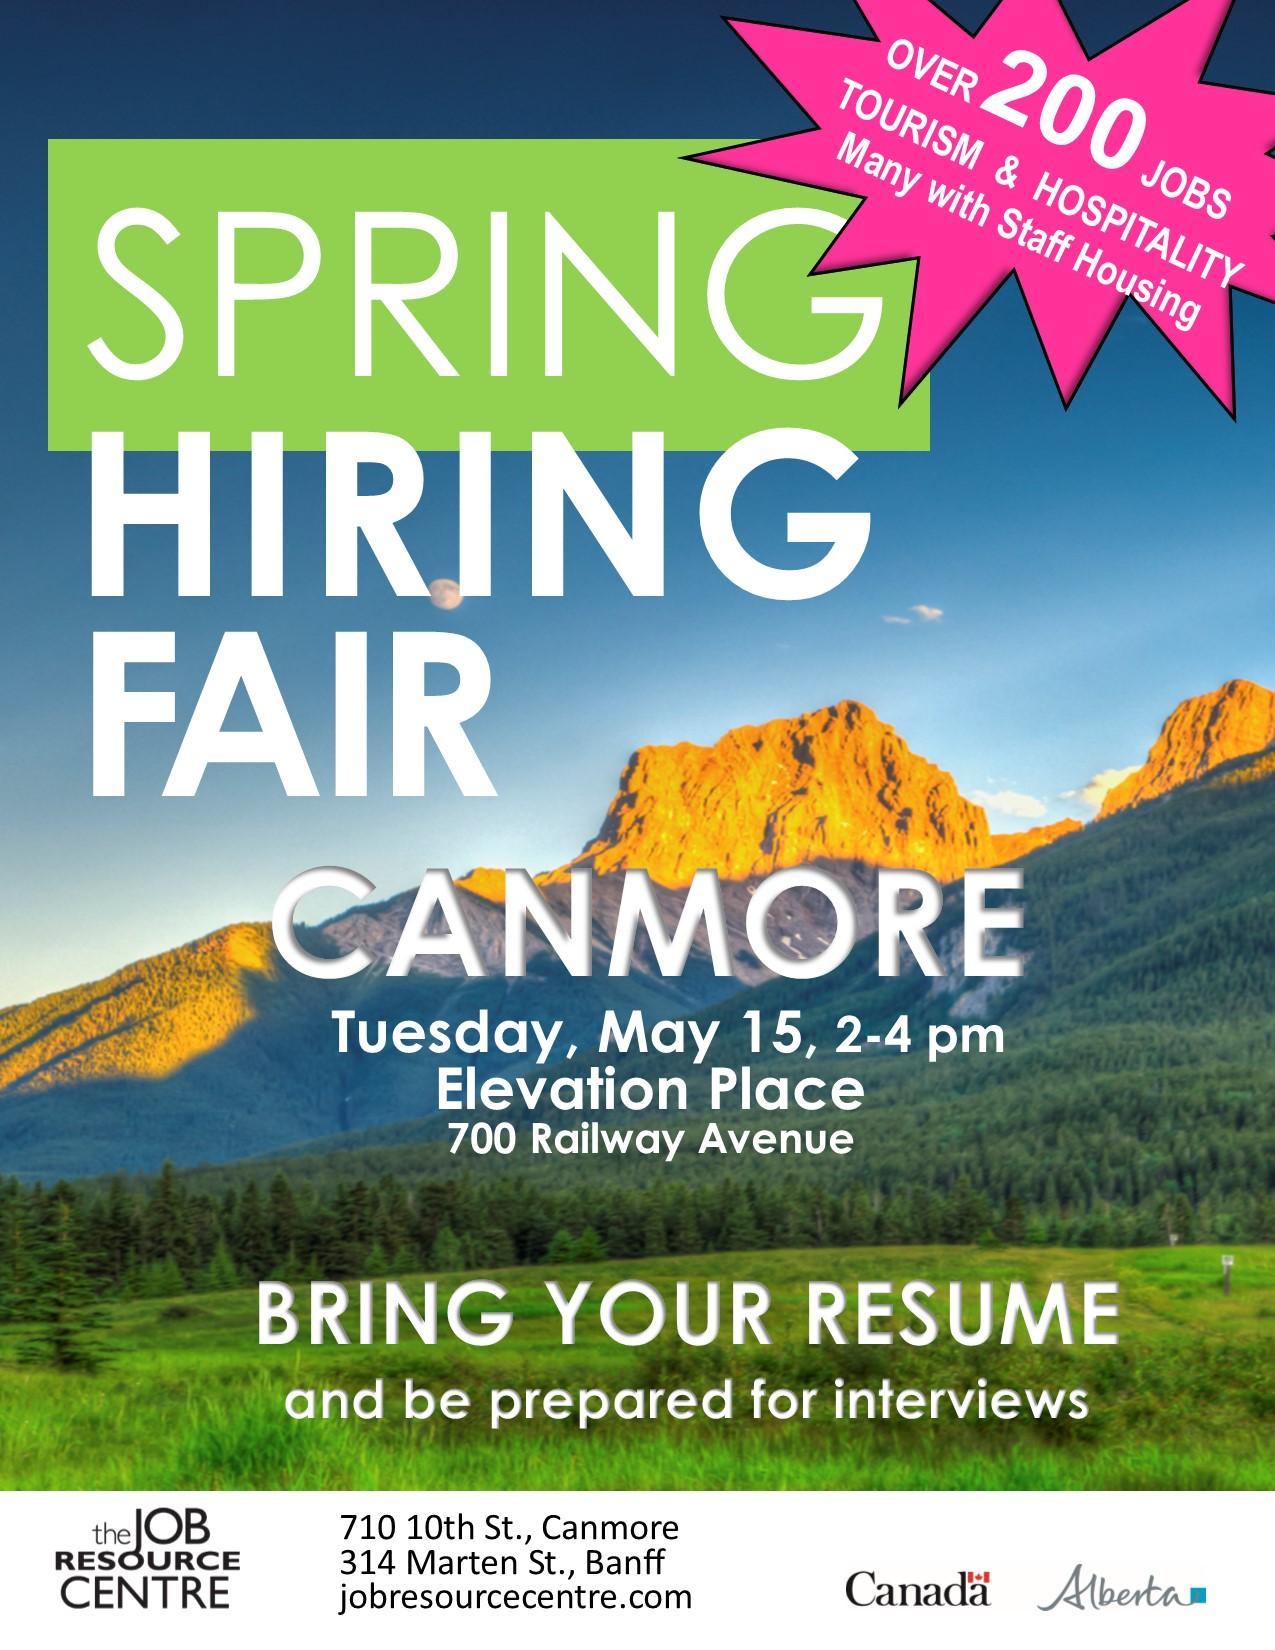 Canmore Spring Hiring Fair letter poster (1).jpg